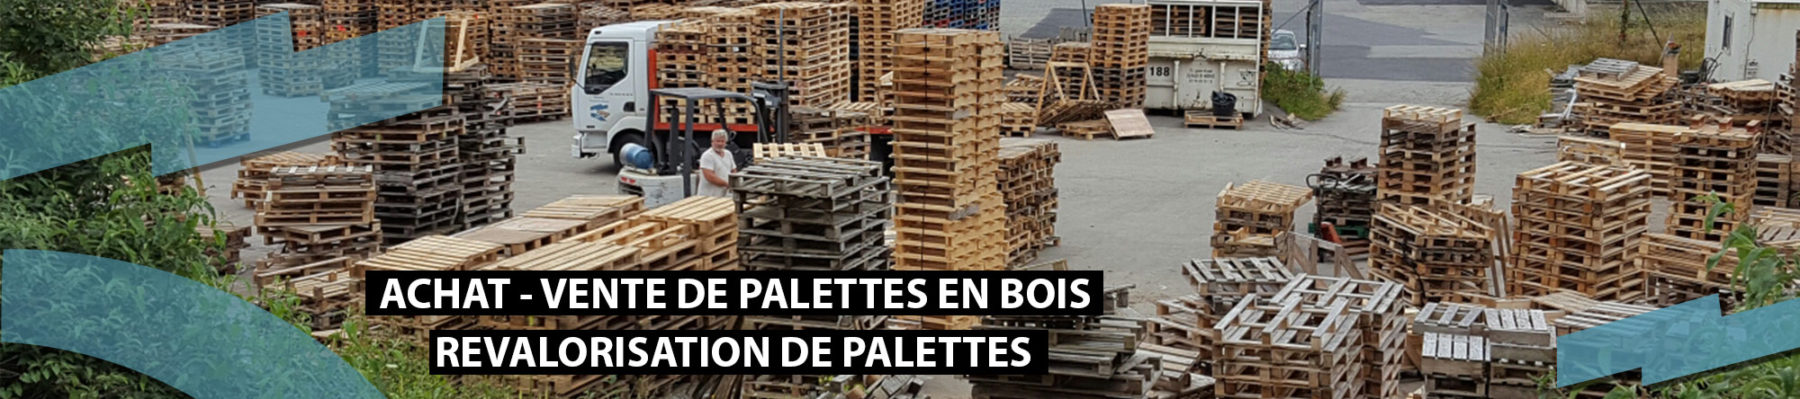 Palettes Iroise